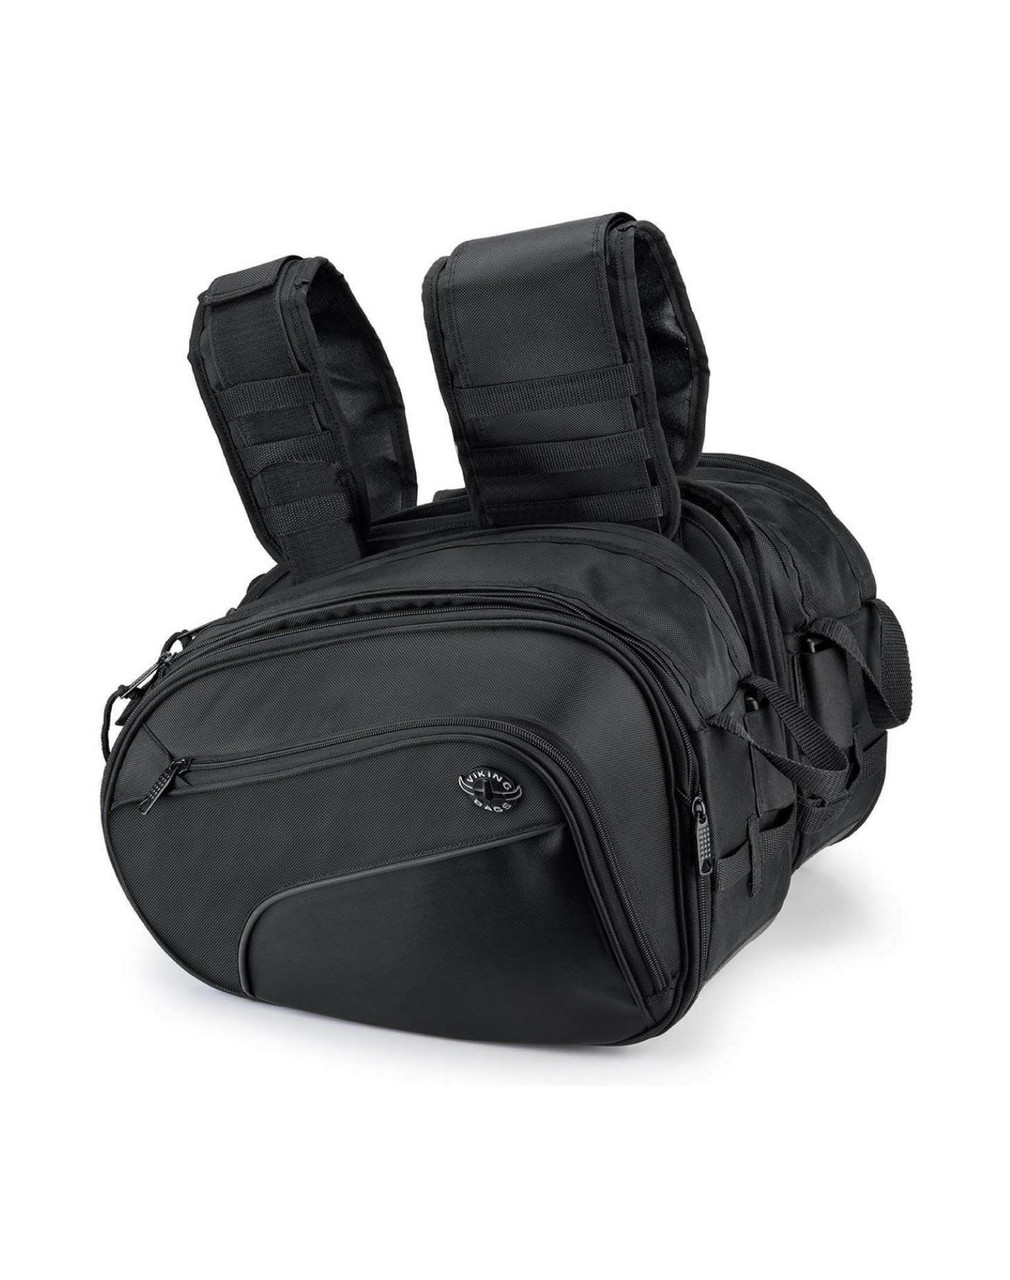 Viking AXE Medium Black Motorcycle Triumph Bonneville T120 Saddlebags Both Bags View